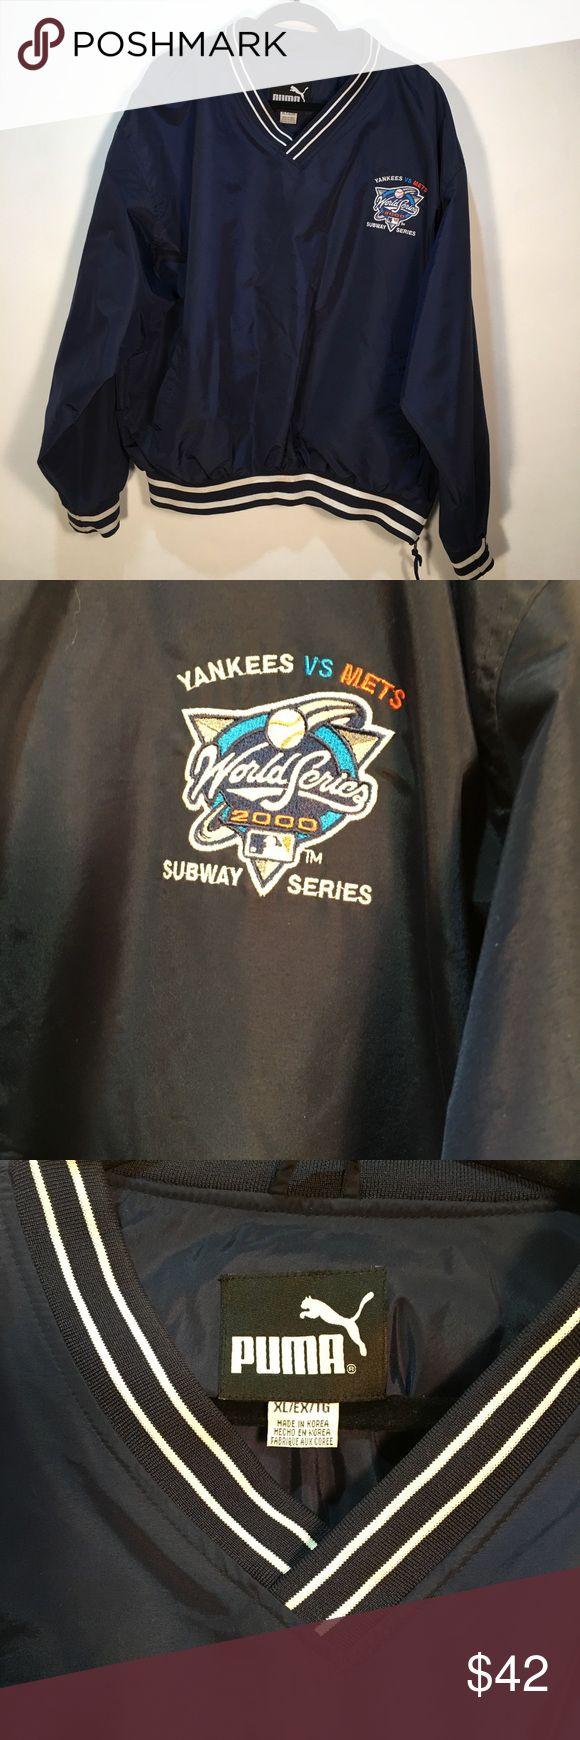 Yankees Met 2000 World Series Puma Jacket Yankees Met 2000 World Series subway series  Puma Jacket with side zip and side pockets . Puma Jackets & Coats Windbreakers